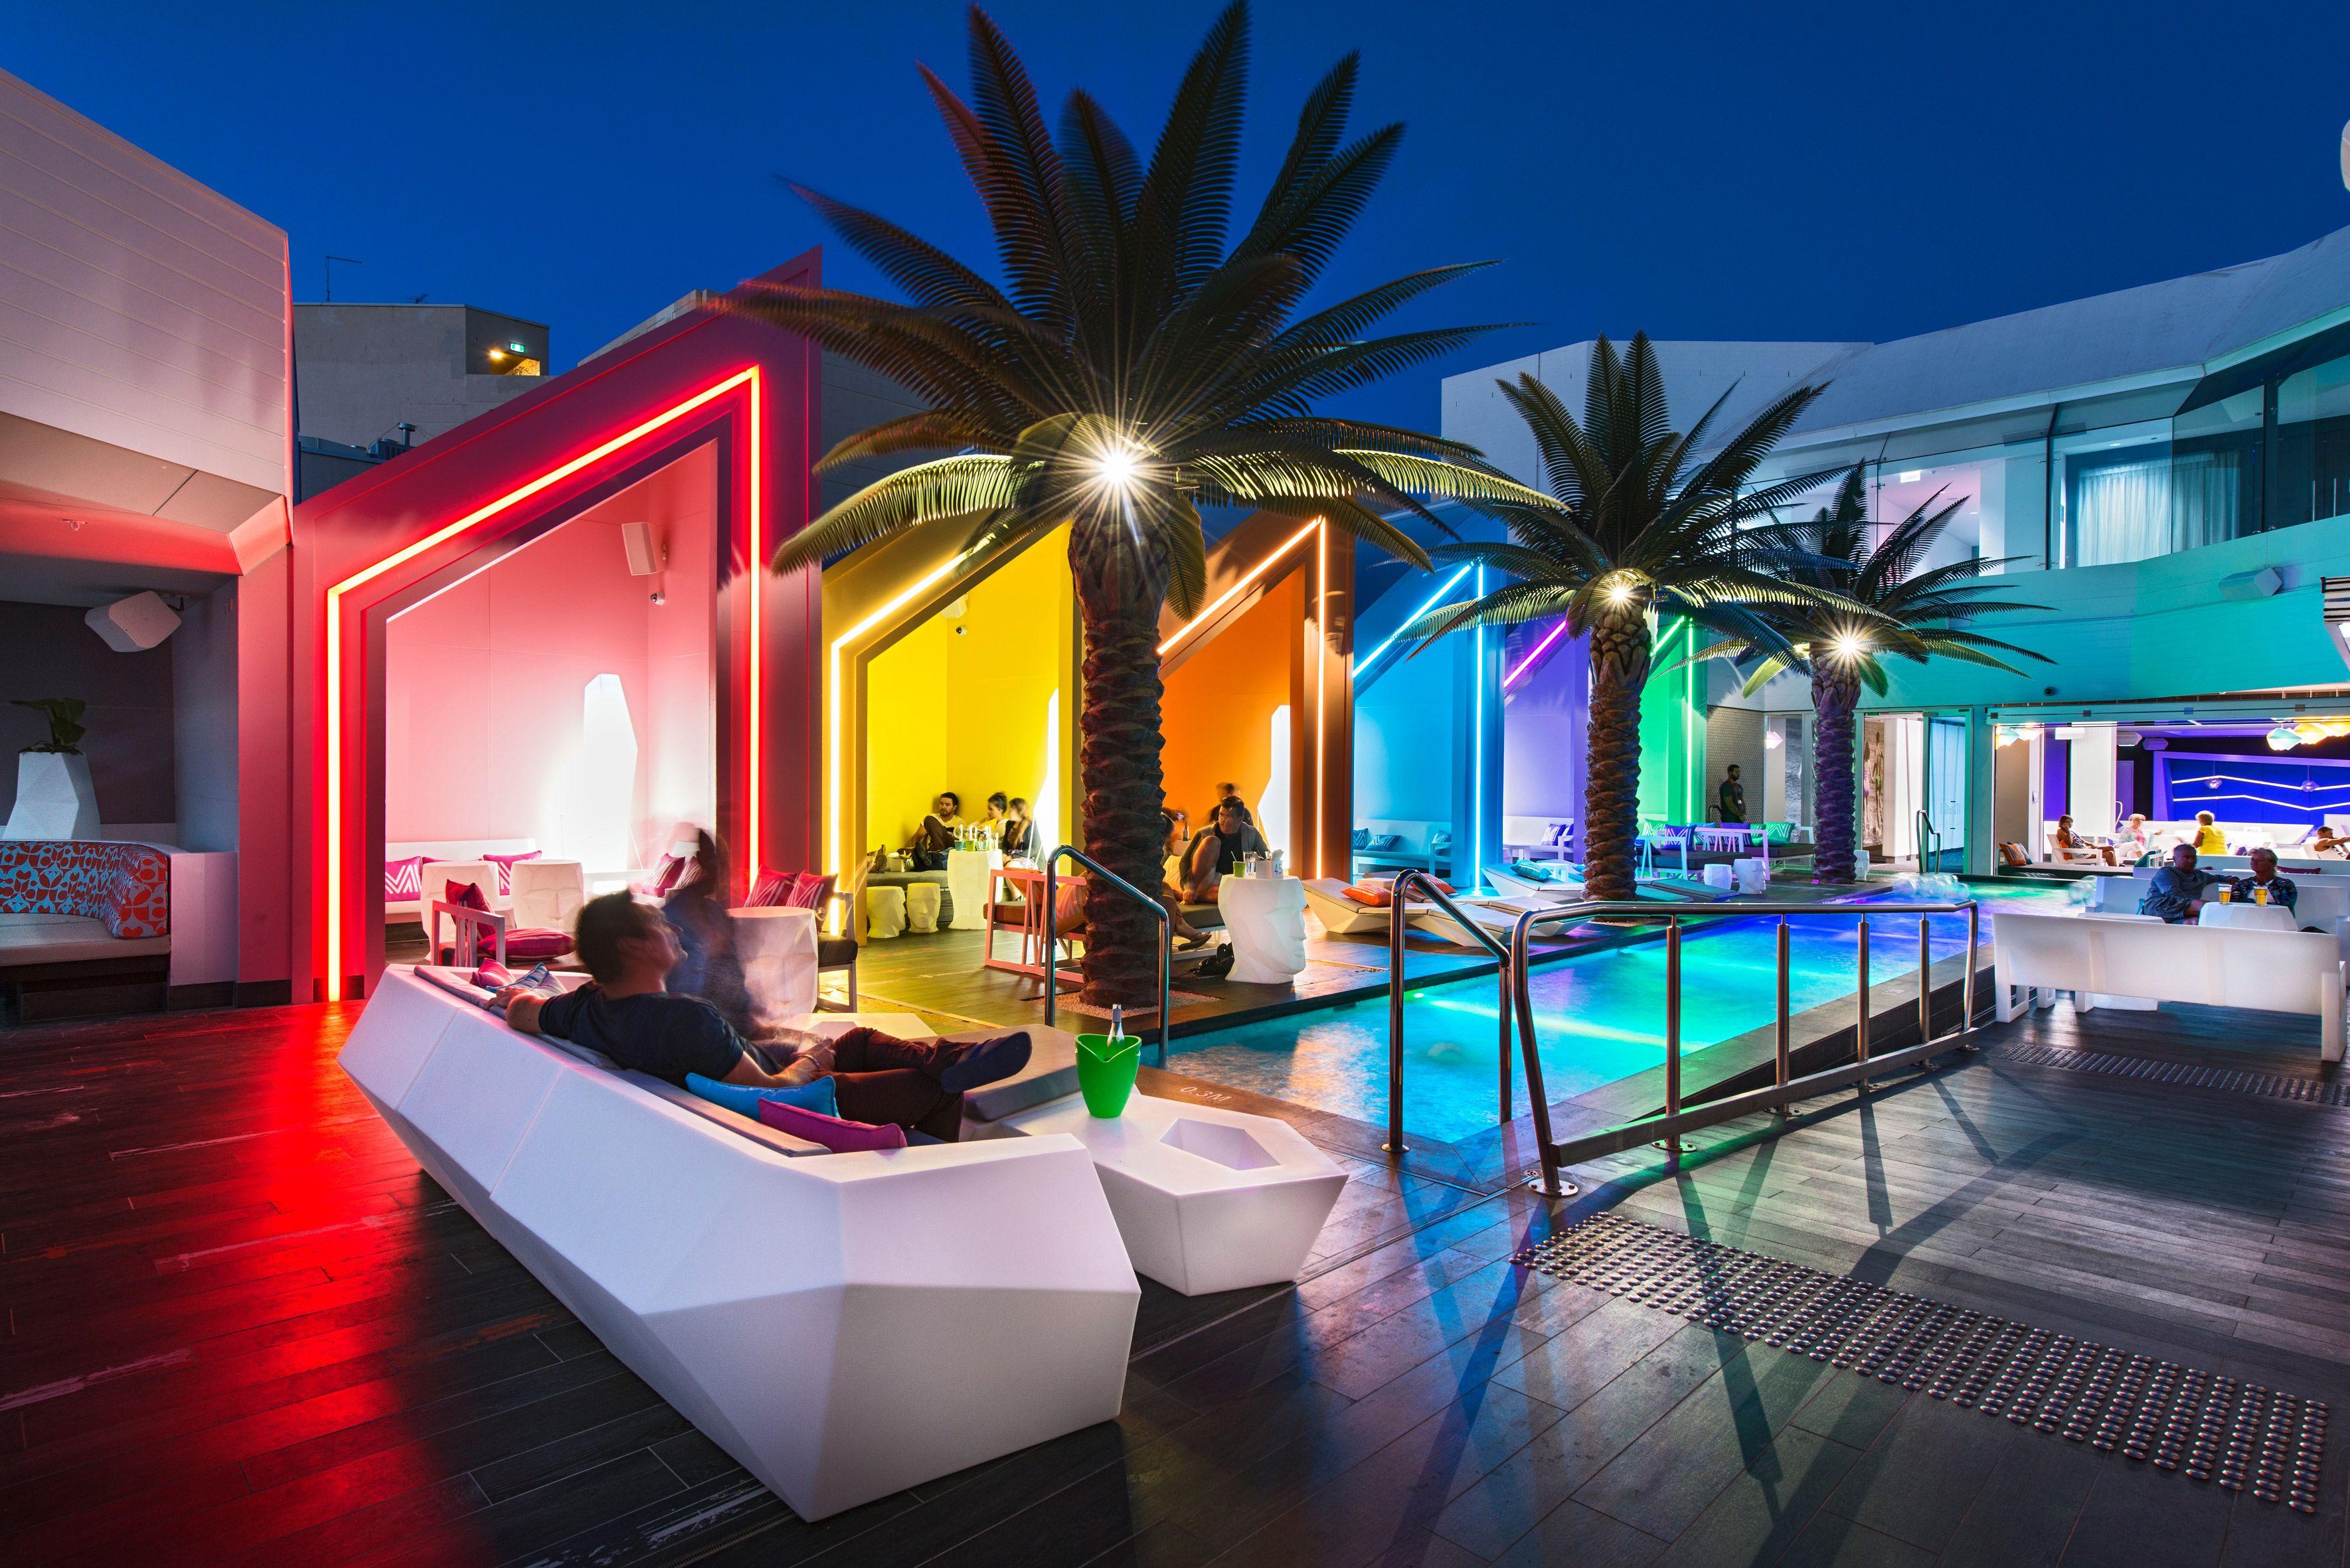 ... Un Bar Australien Au Design Unique. Furniture From Spain :  International Projetcs : Matisse Beach Club : VONDOM. Matisse Beach Club